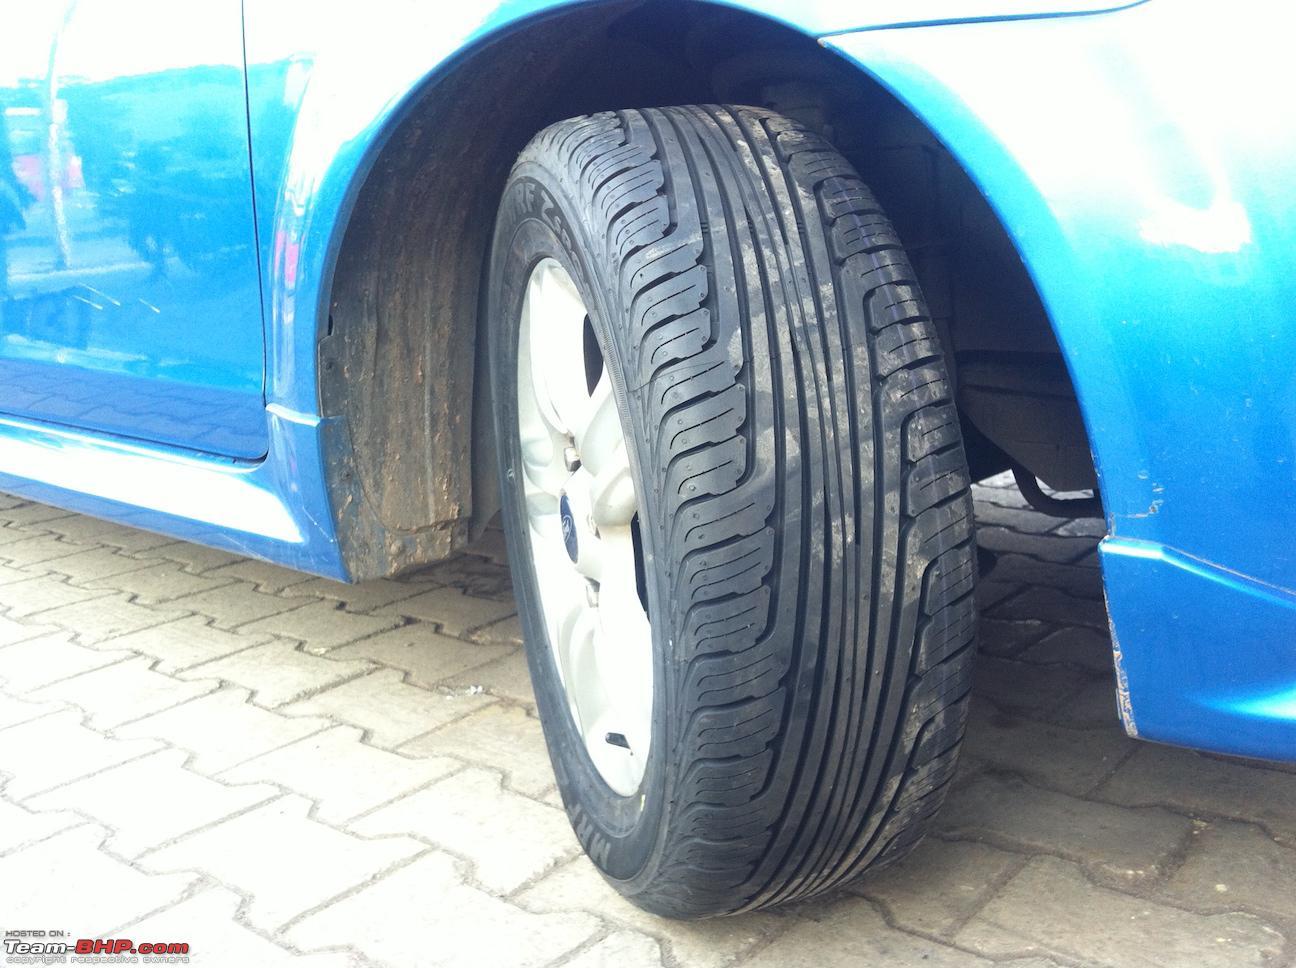 Ford Fiesta Tyre Wheel Upgrade Thread Img_ Jpg